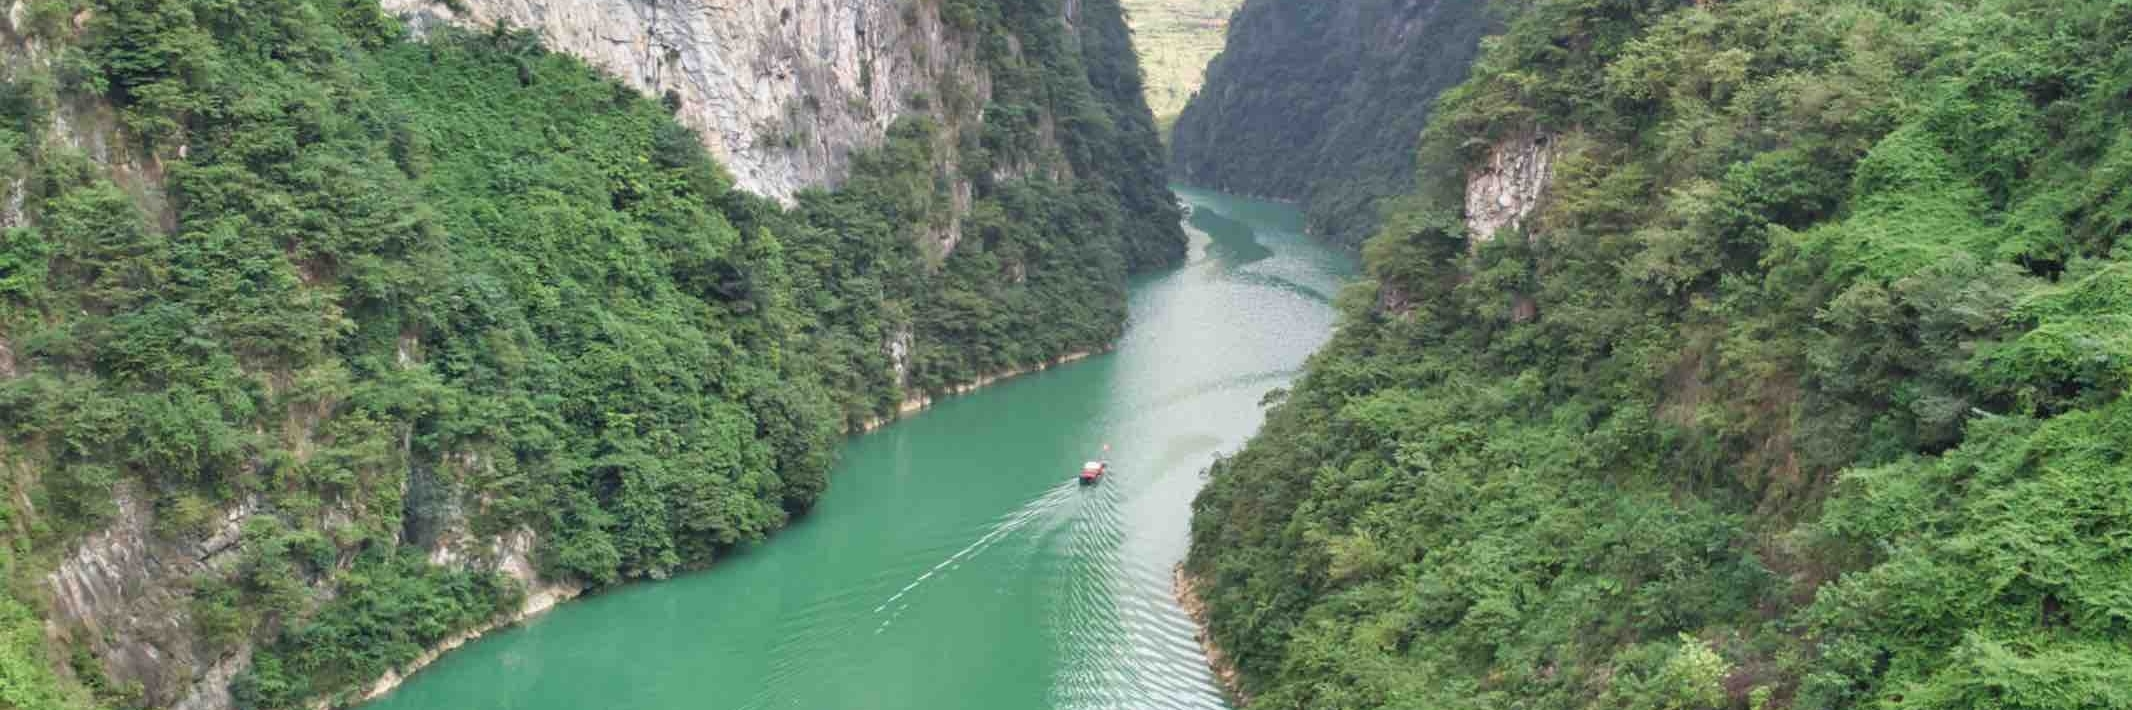 https://gody.vn/blog/dien8164/post/doc-la-di-thuyen-cheo-kayak-tai-song-nho-que-kinh-nghiem-di-lai-cach-lien-he-nha-thuyen-6086